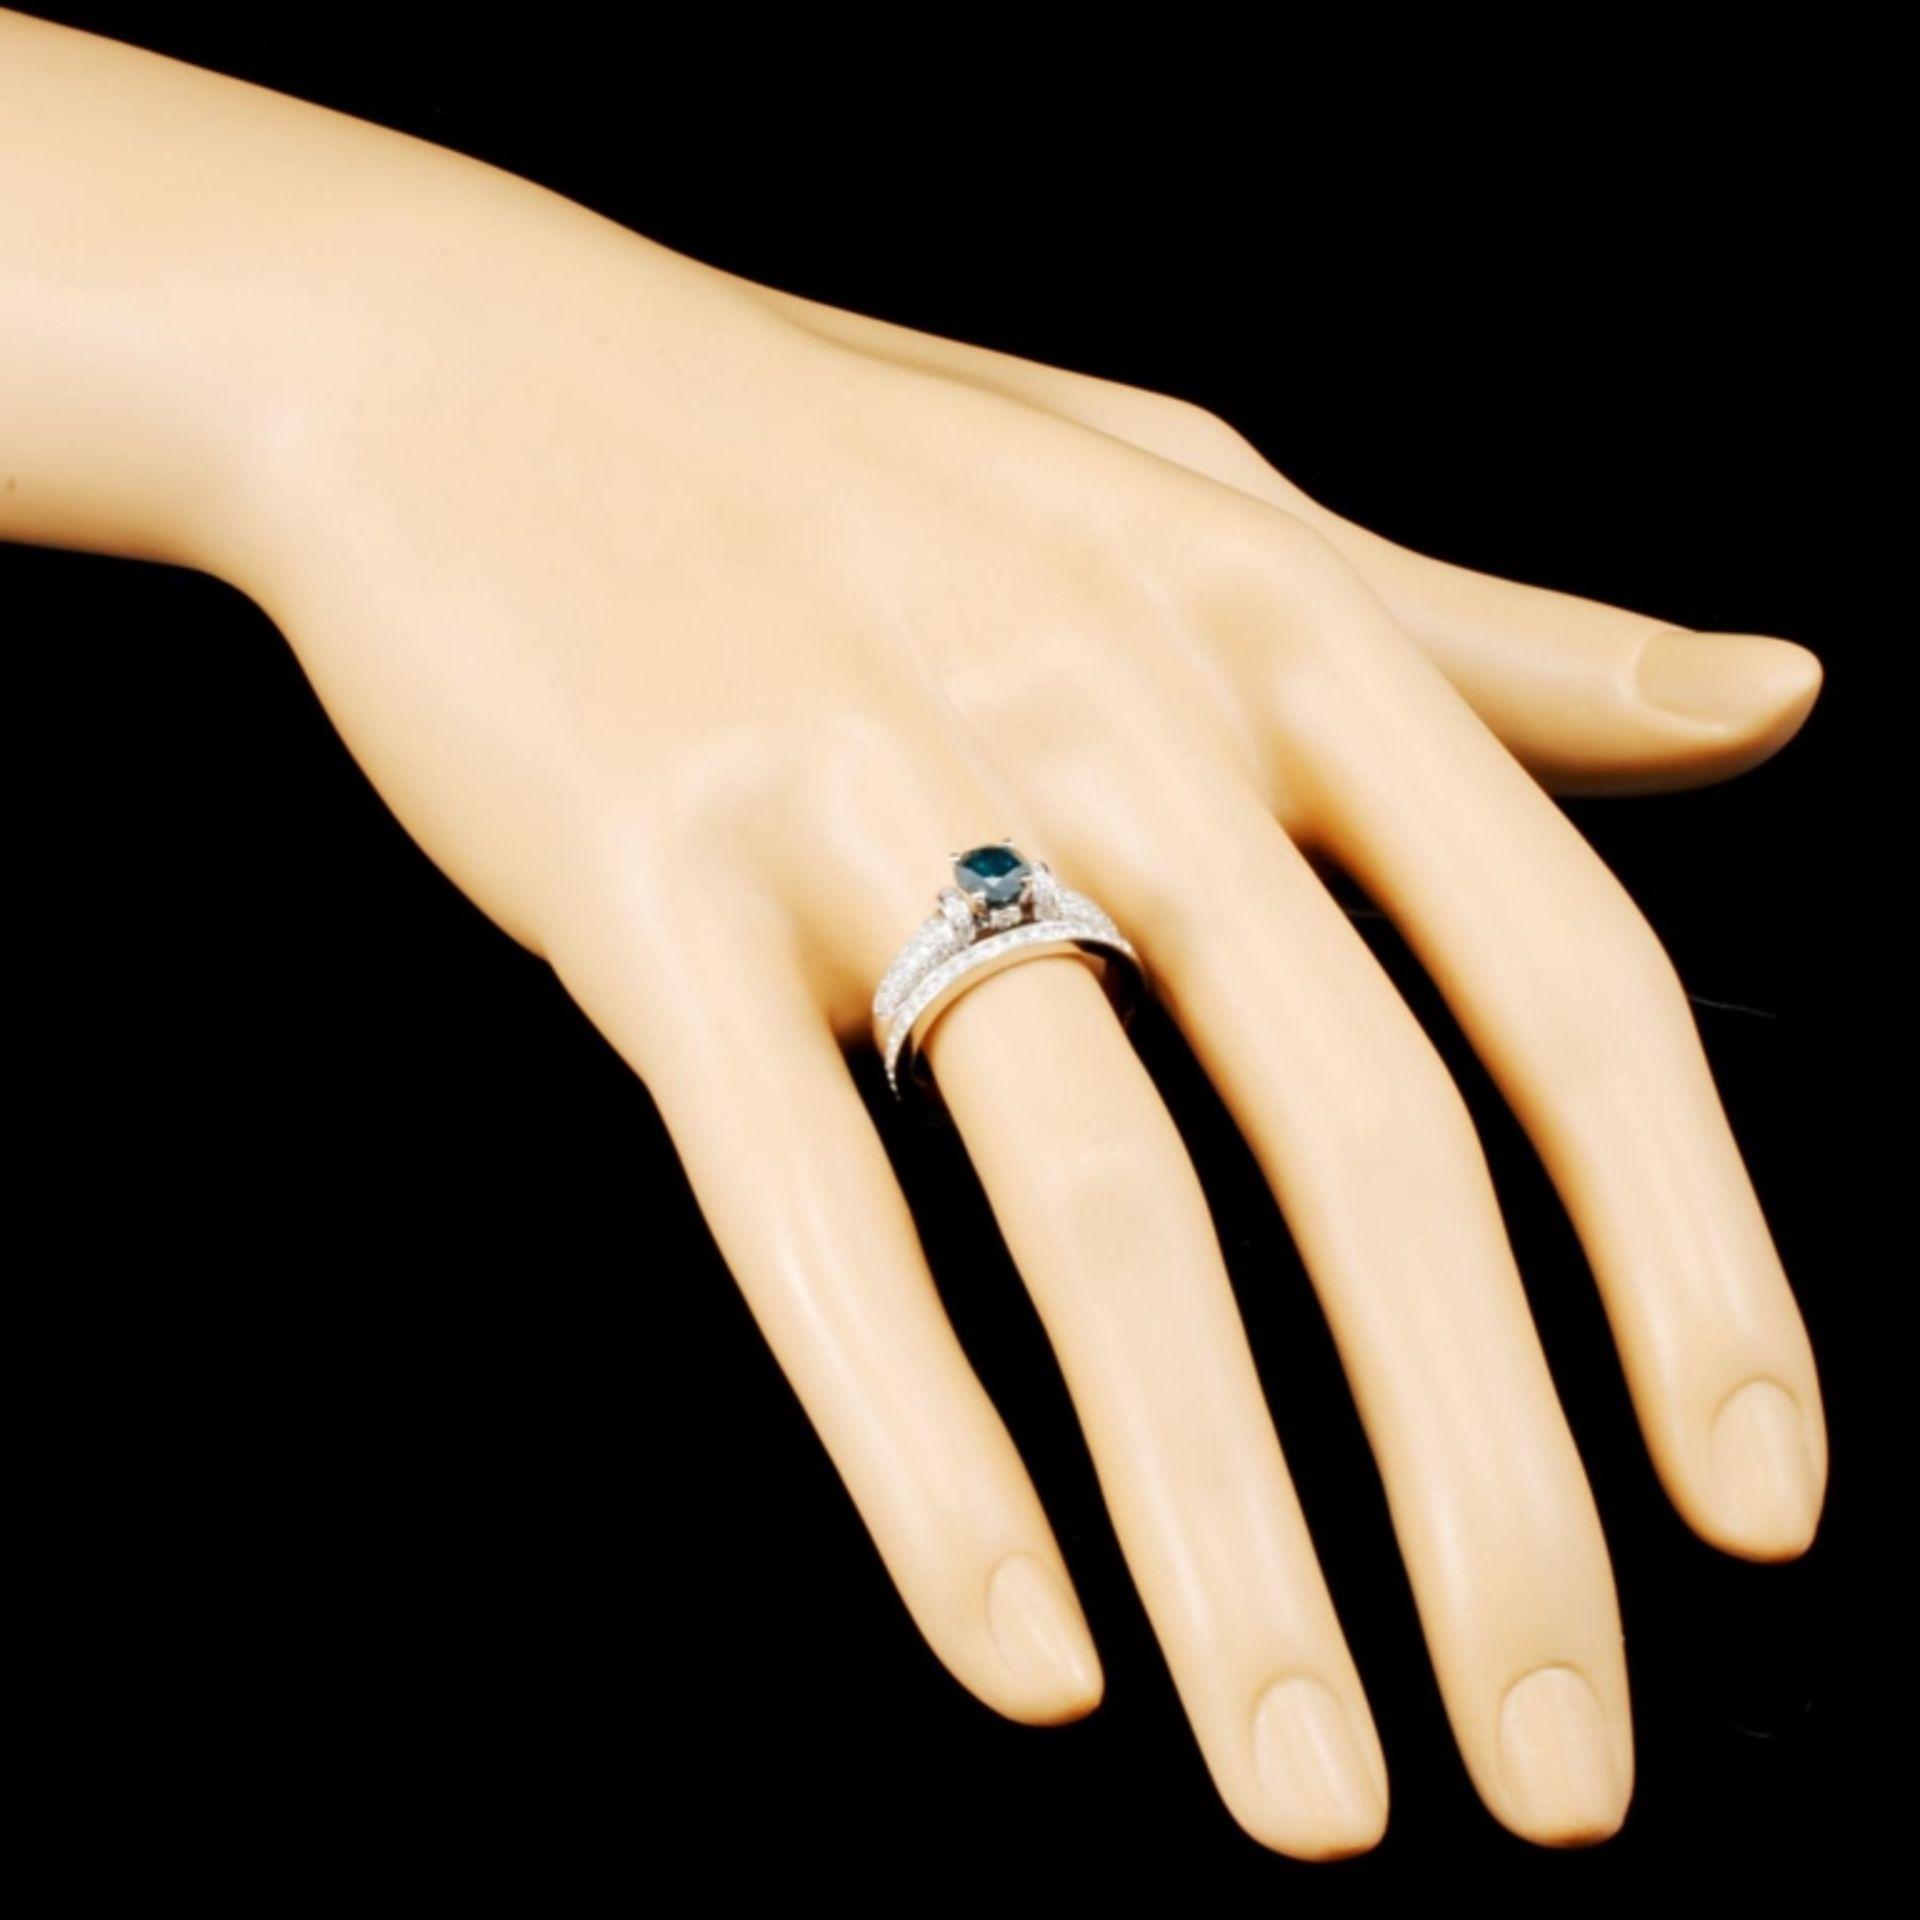 18K Gold 1.32ctw Diamond Ring - Image 3 of 5